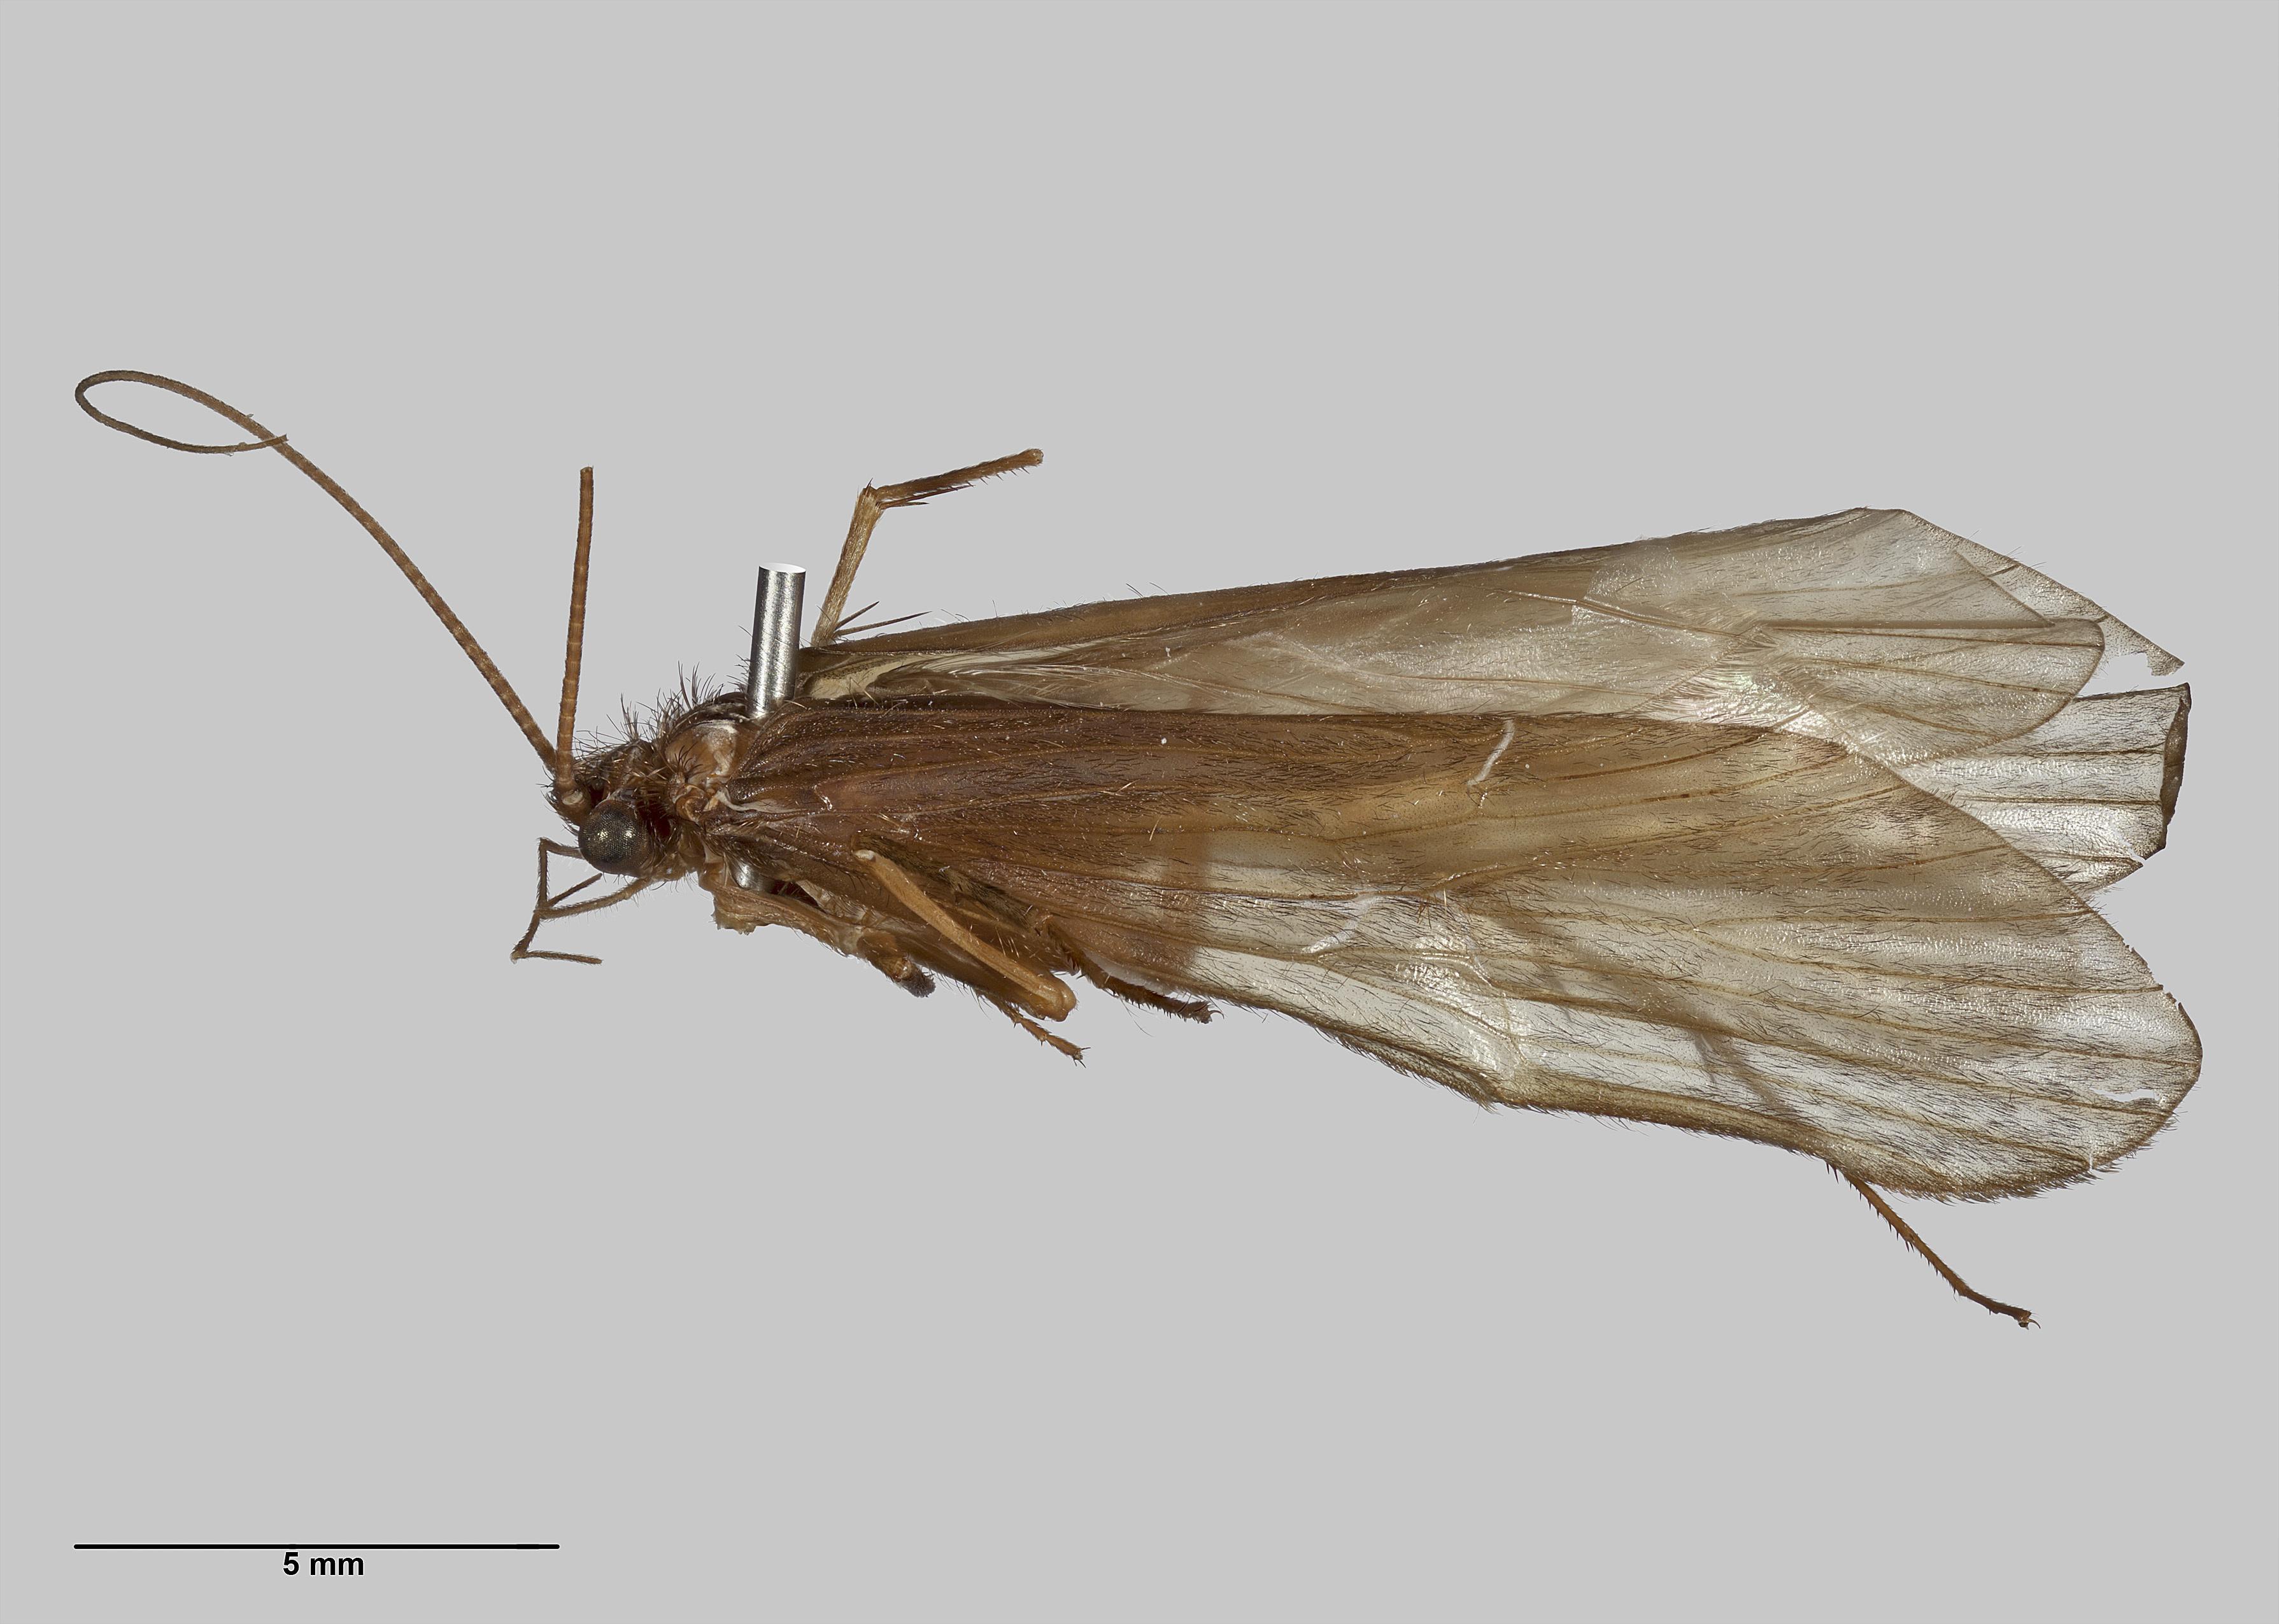 Image of Hydrobiosidae